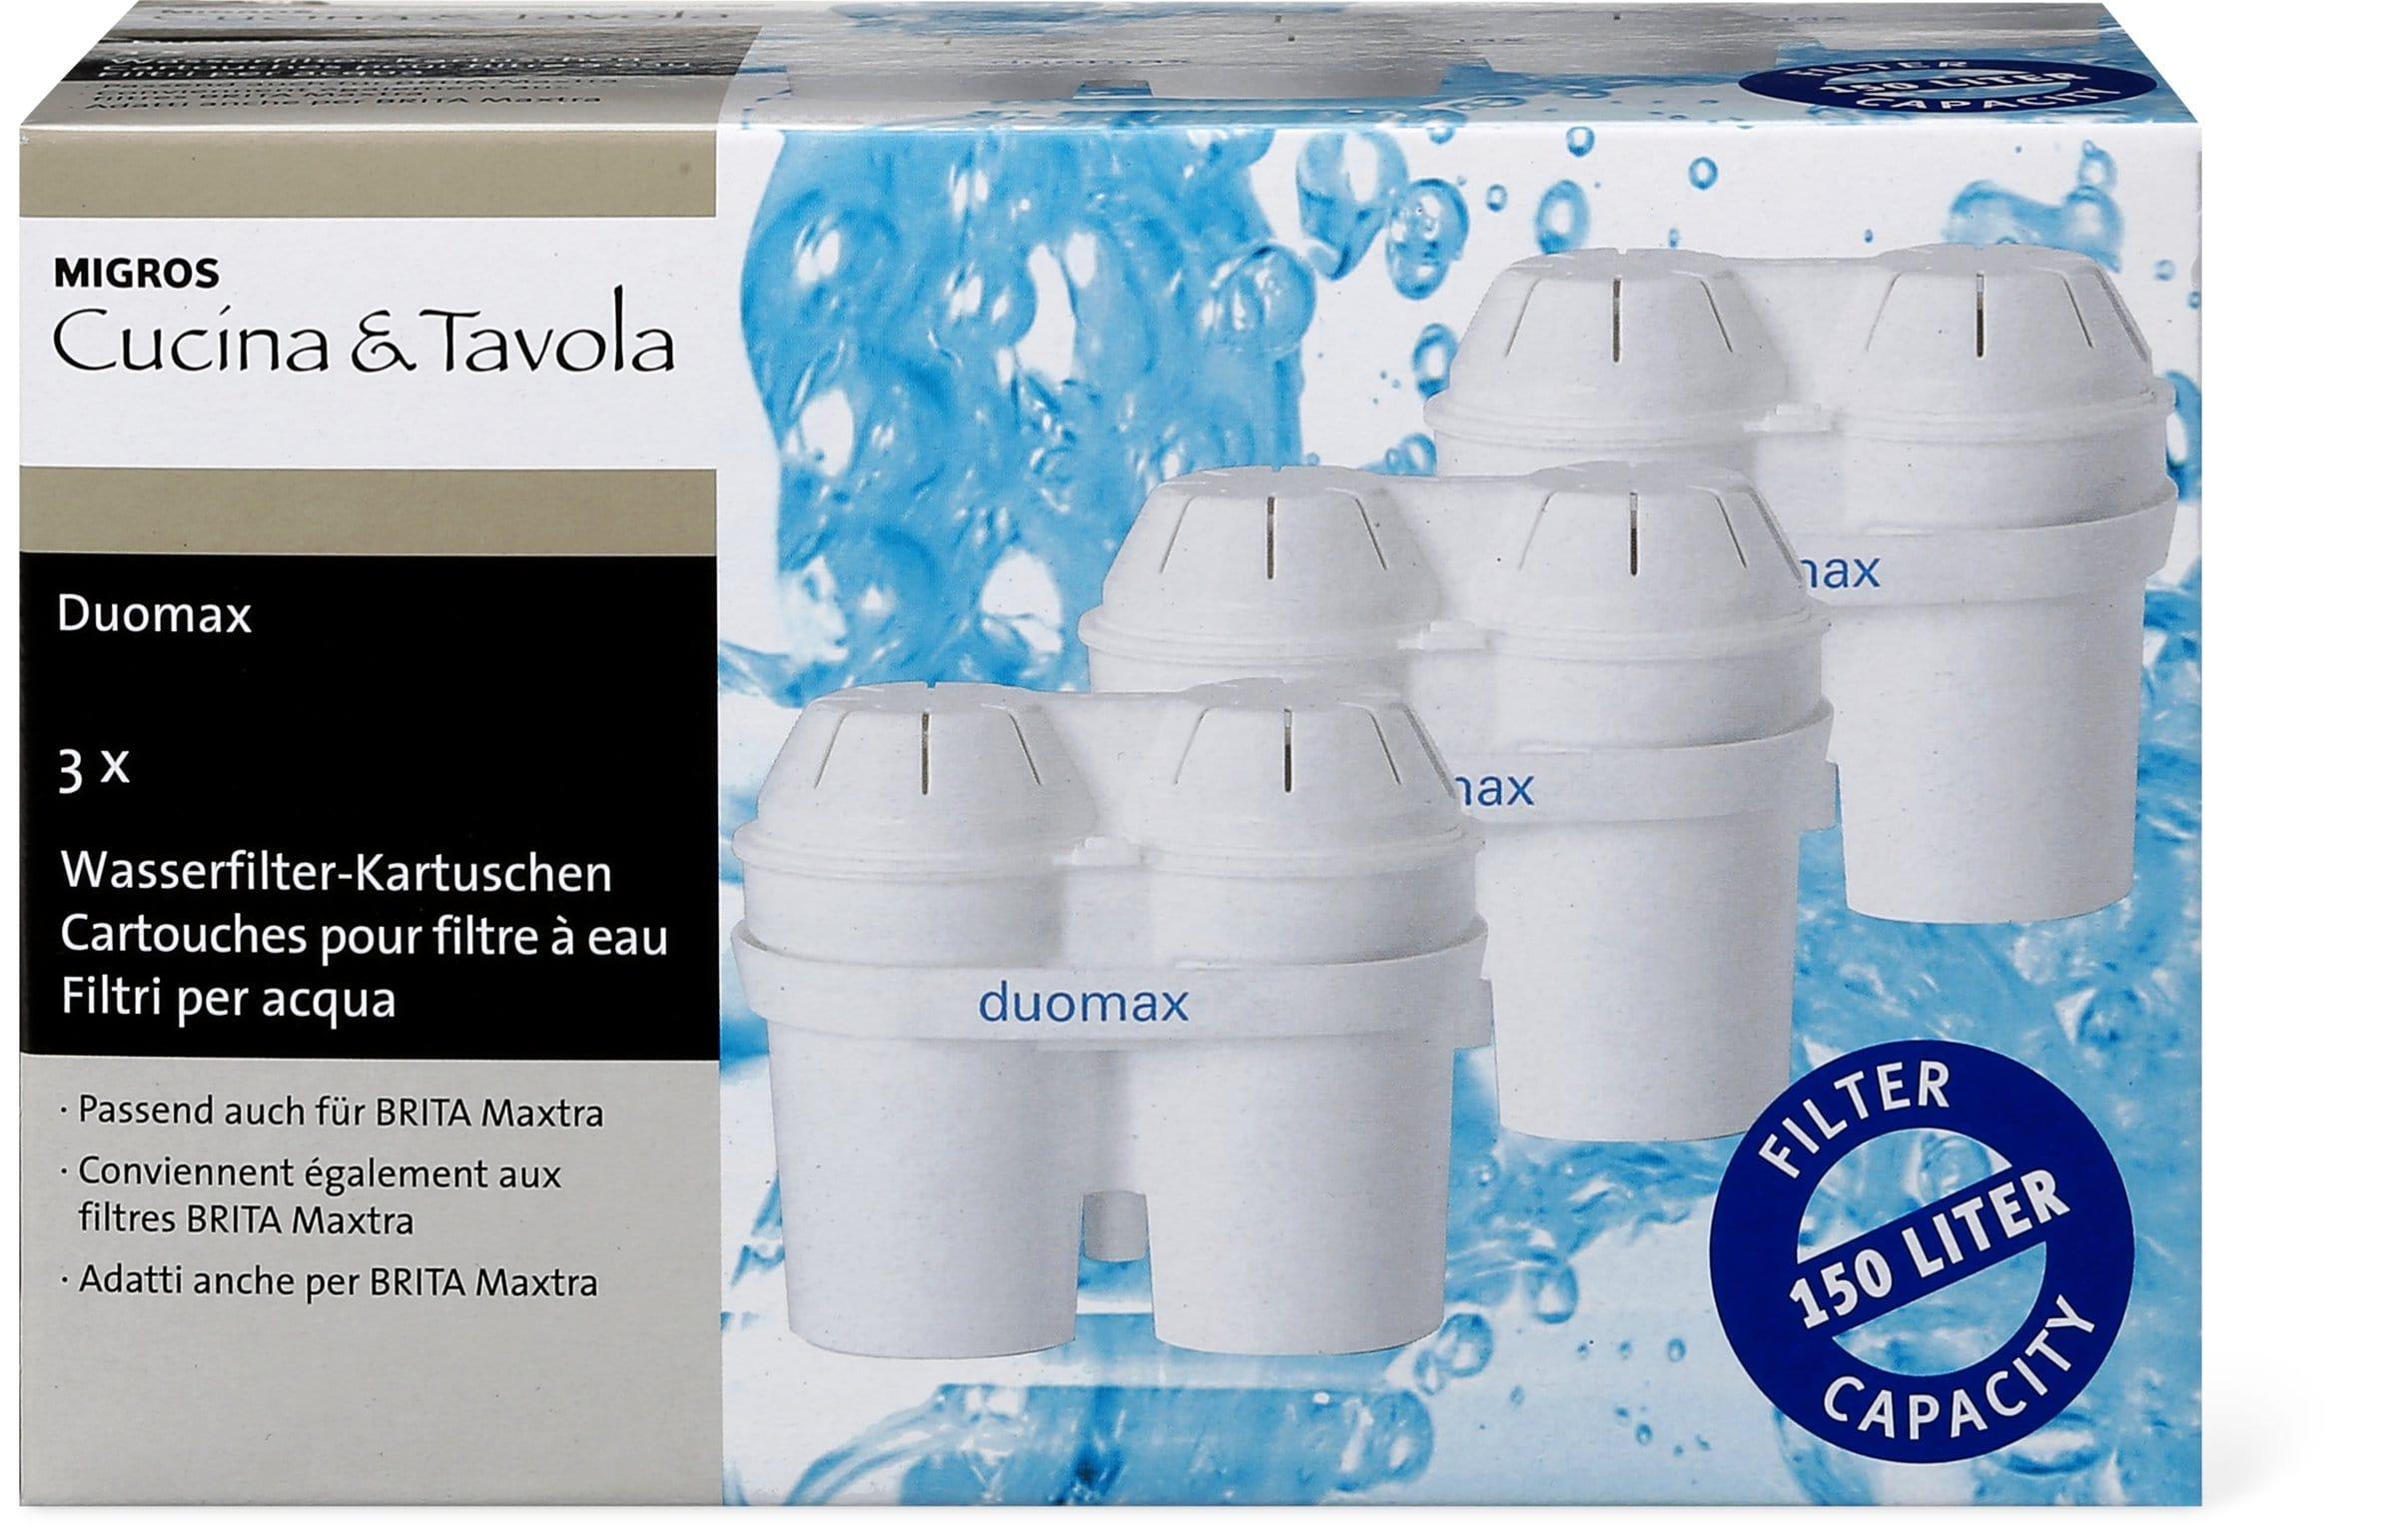 Cucina & Tavola Wasserfilterkartuschen